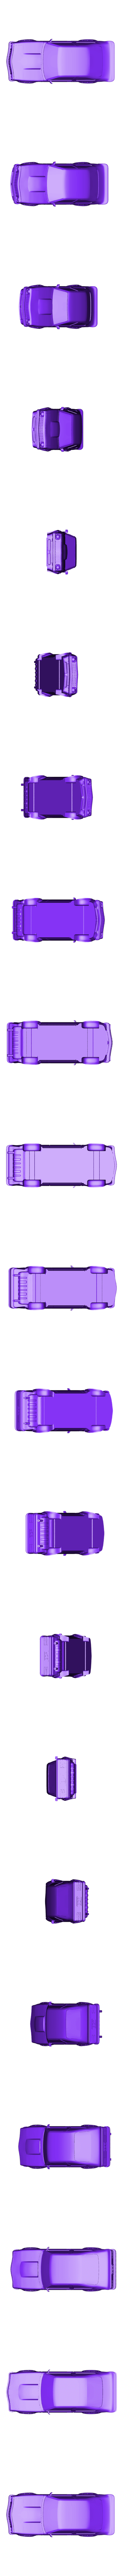 Holden Torana A9X.stl Download STL file Holden Torana A9X Supercharger • 3D print model, Custom3DPrinting